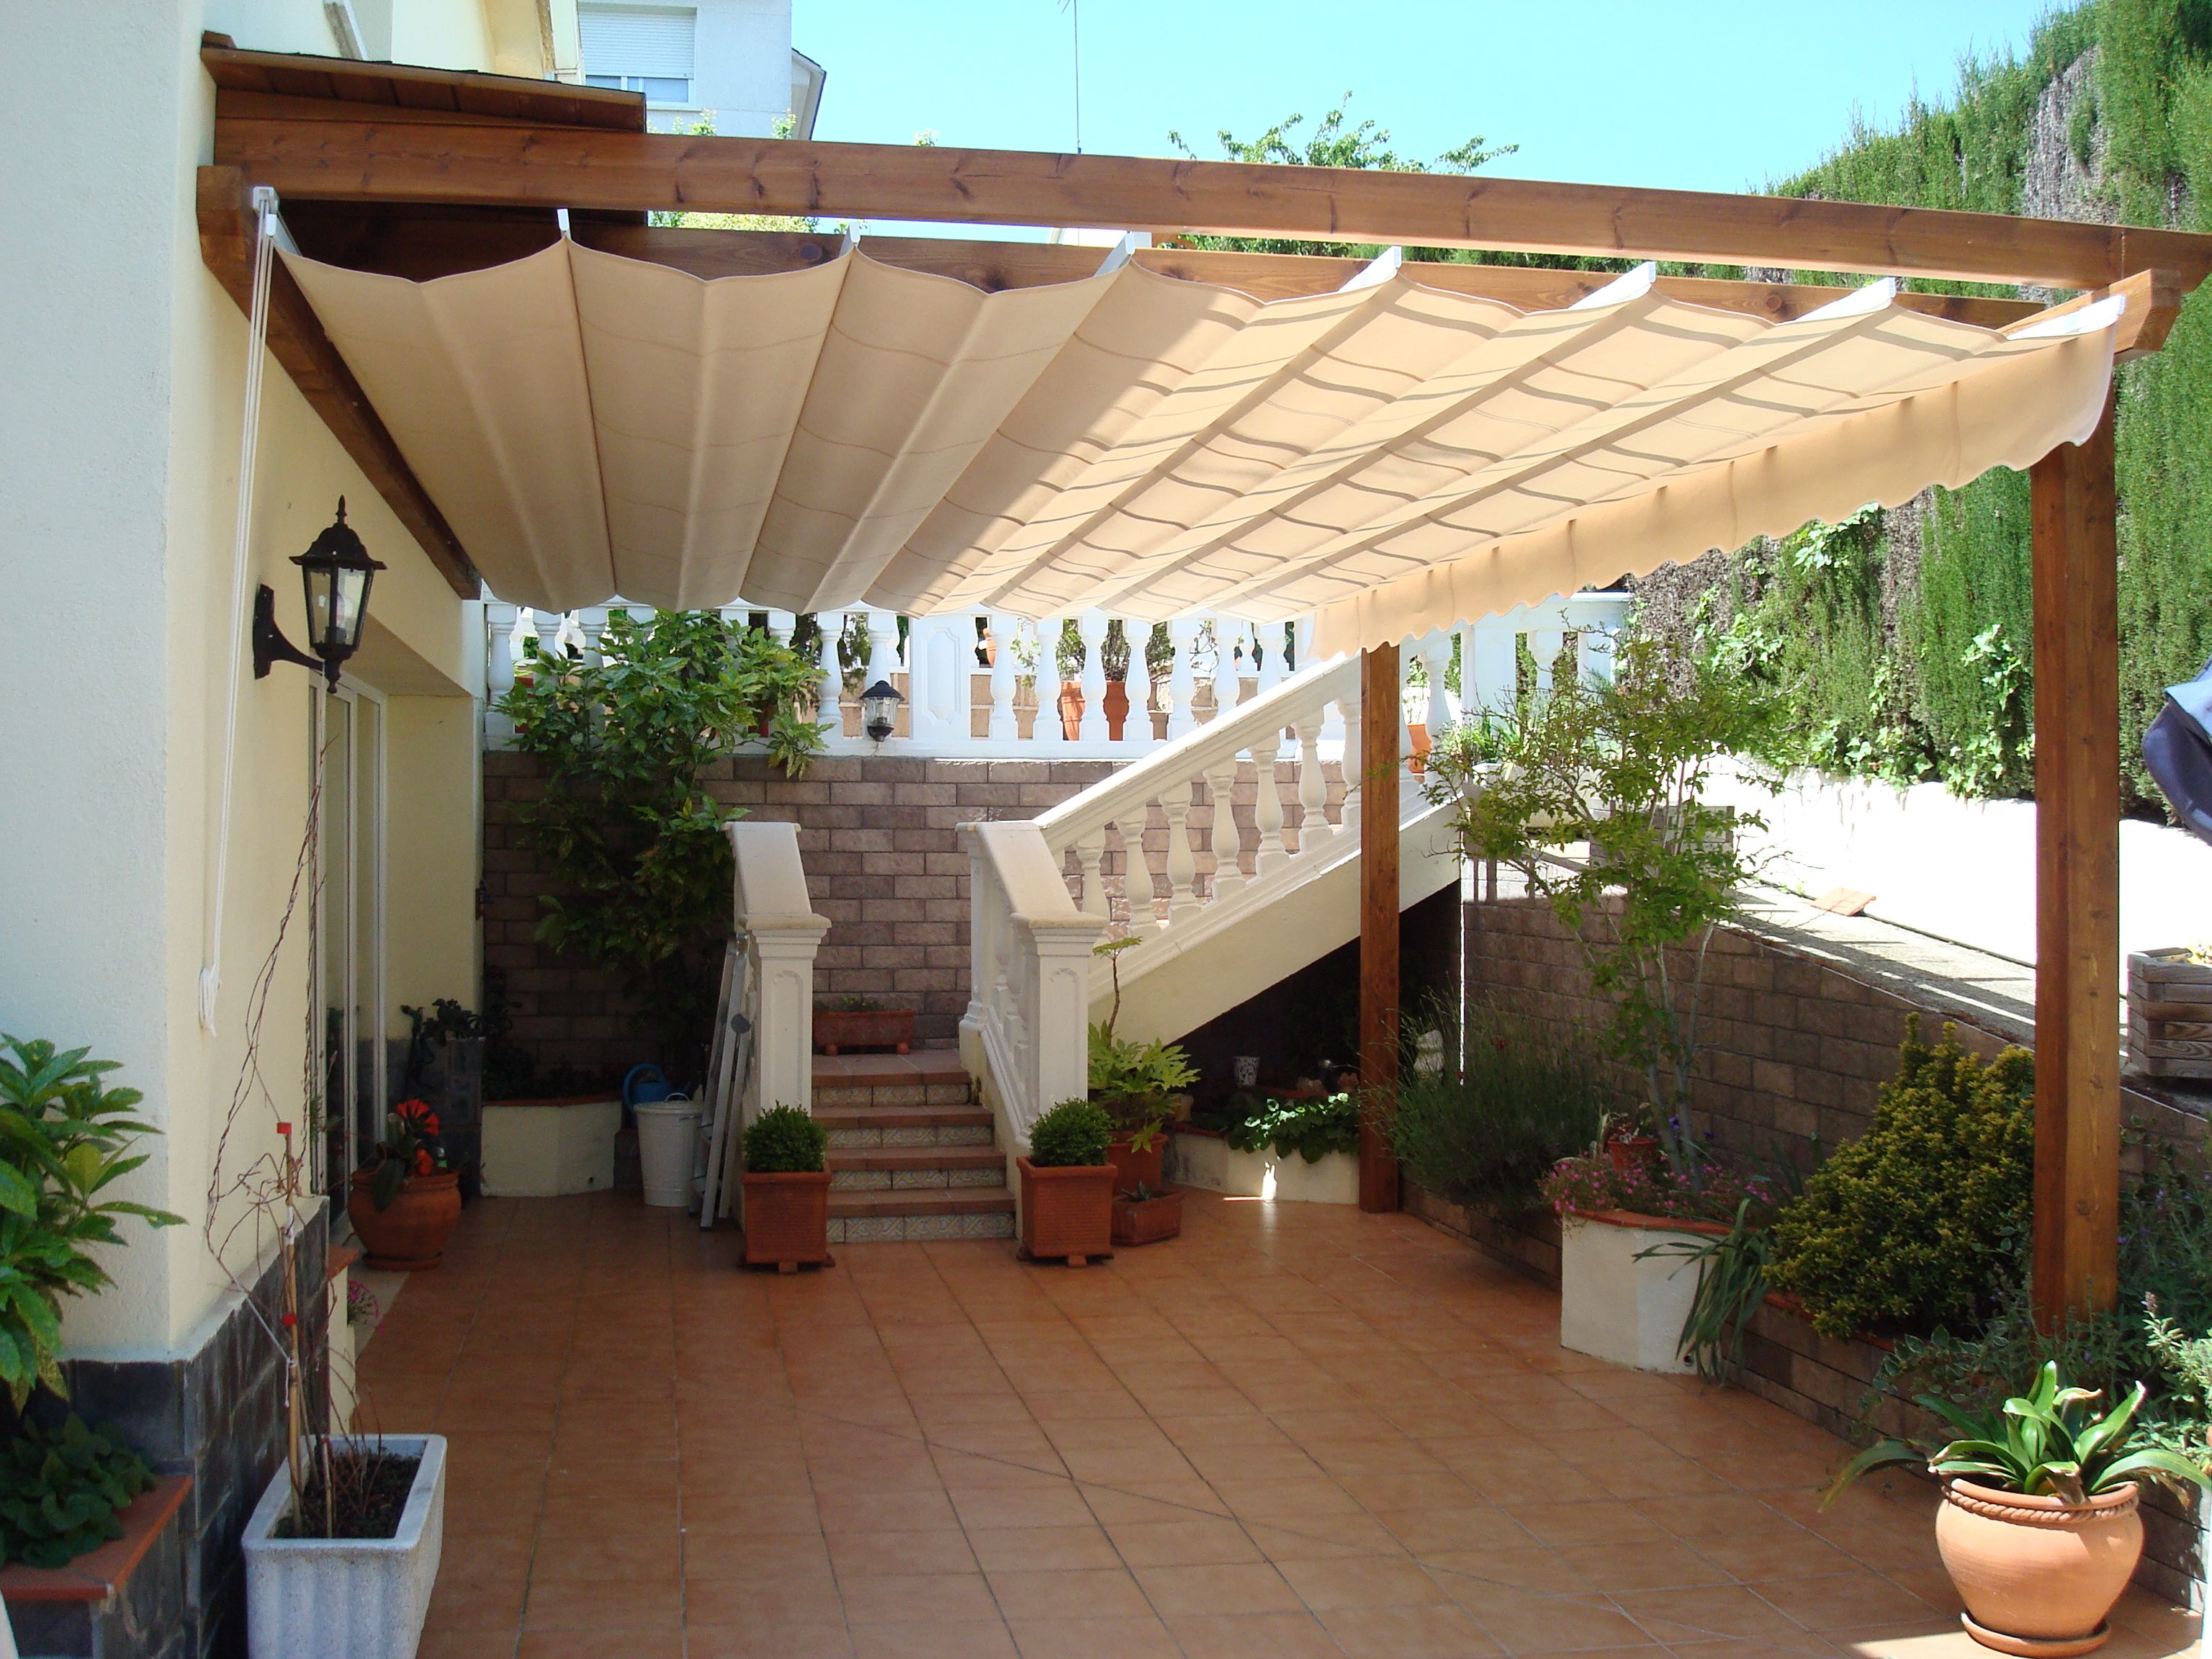 P rgola adosada con toldo acrilico corredero pergolas de for Toldos para patios